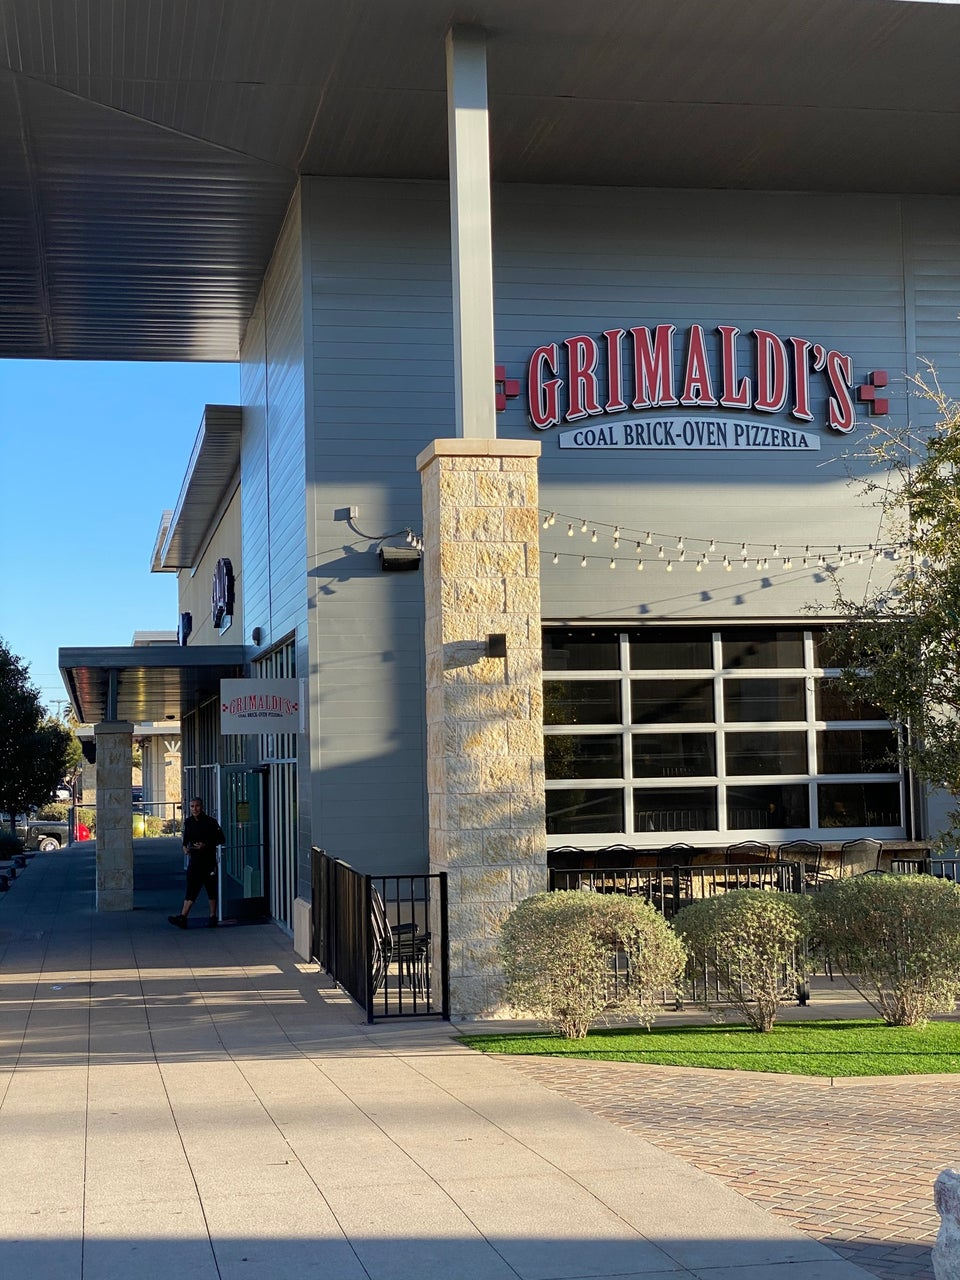 Grimaldi's Pizzeria 8889 Gateway Blvd W Ste 1200, El Paso